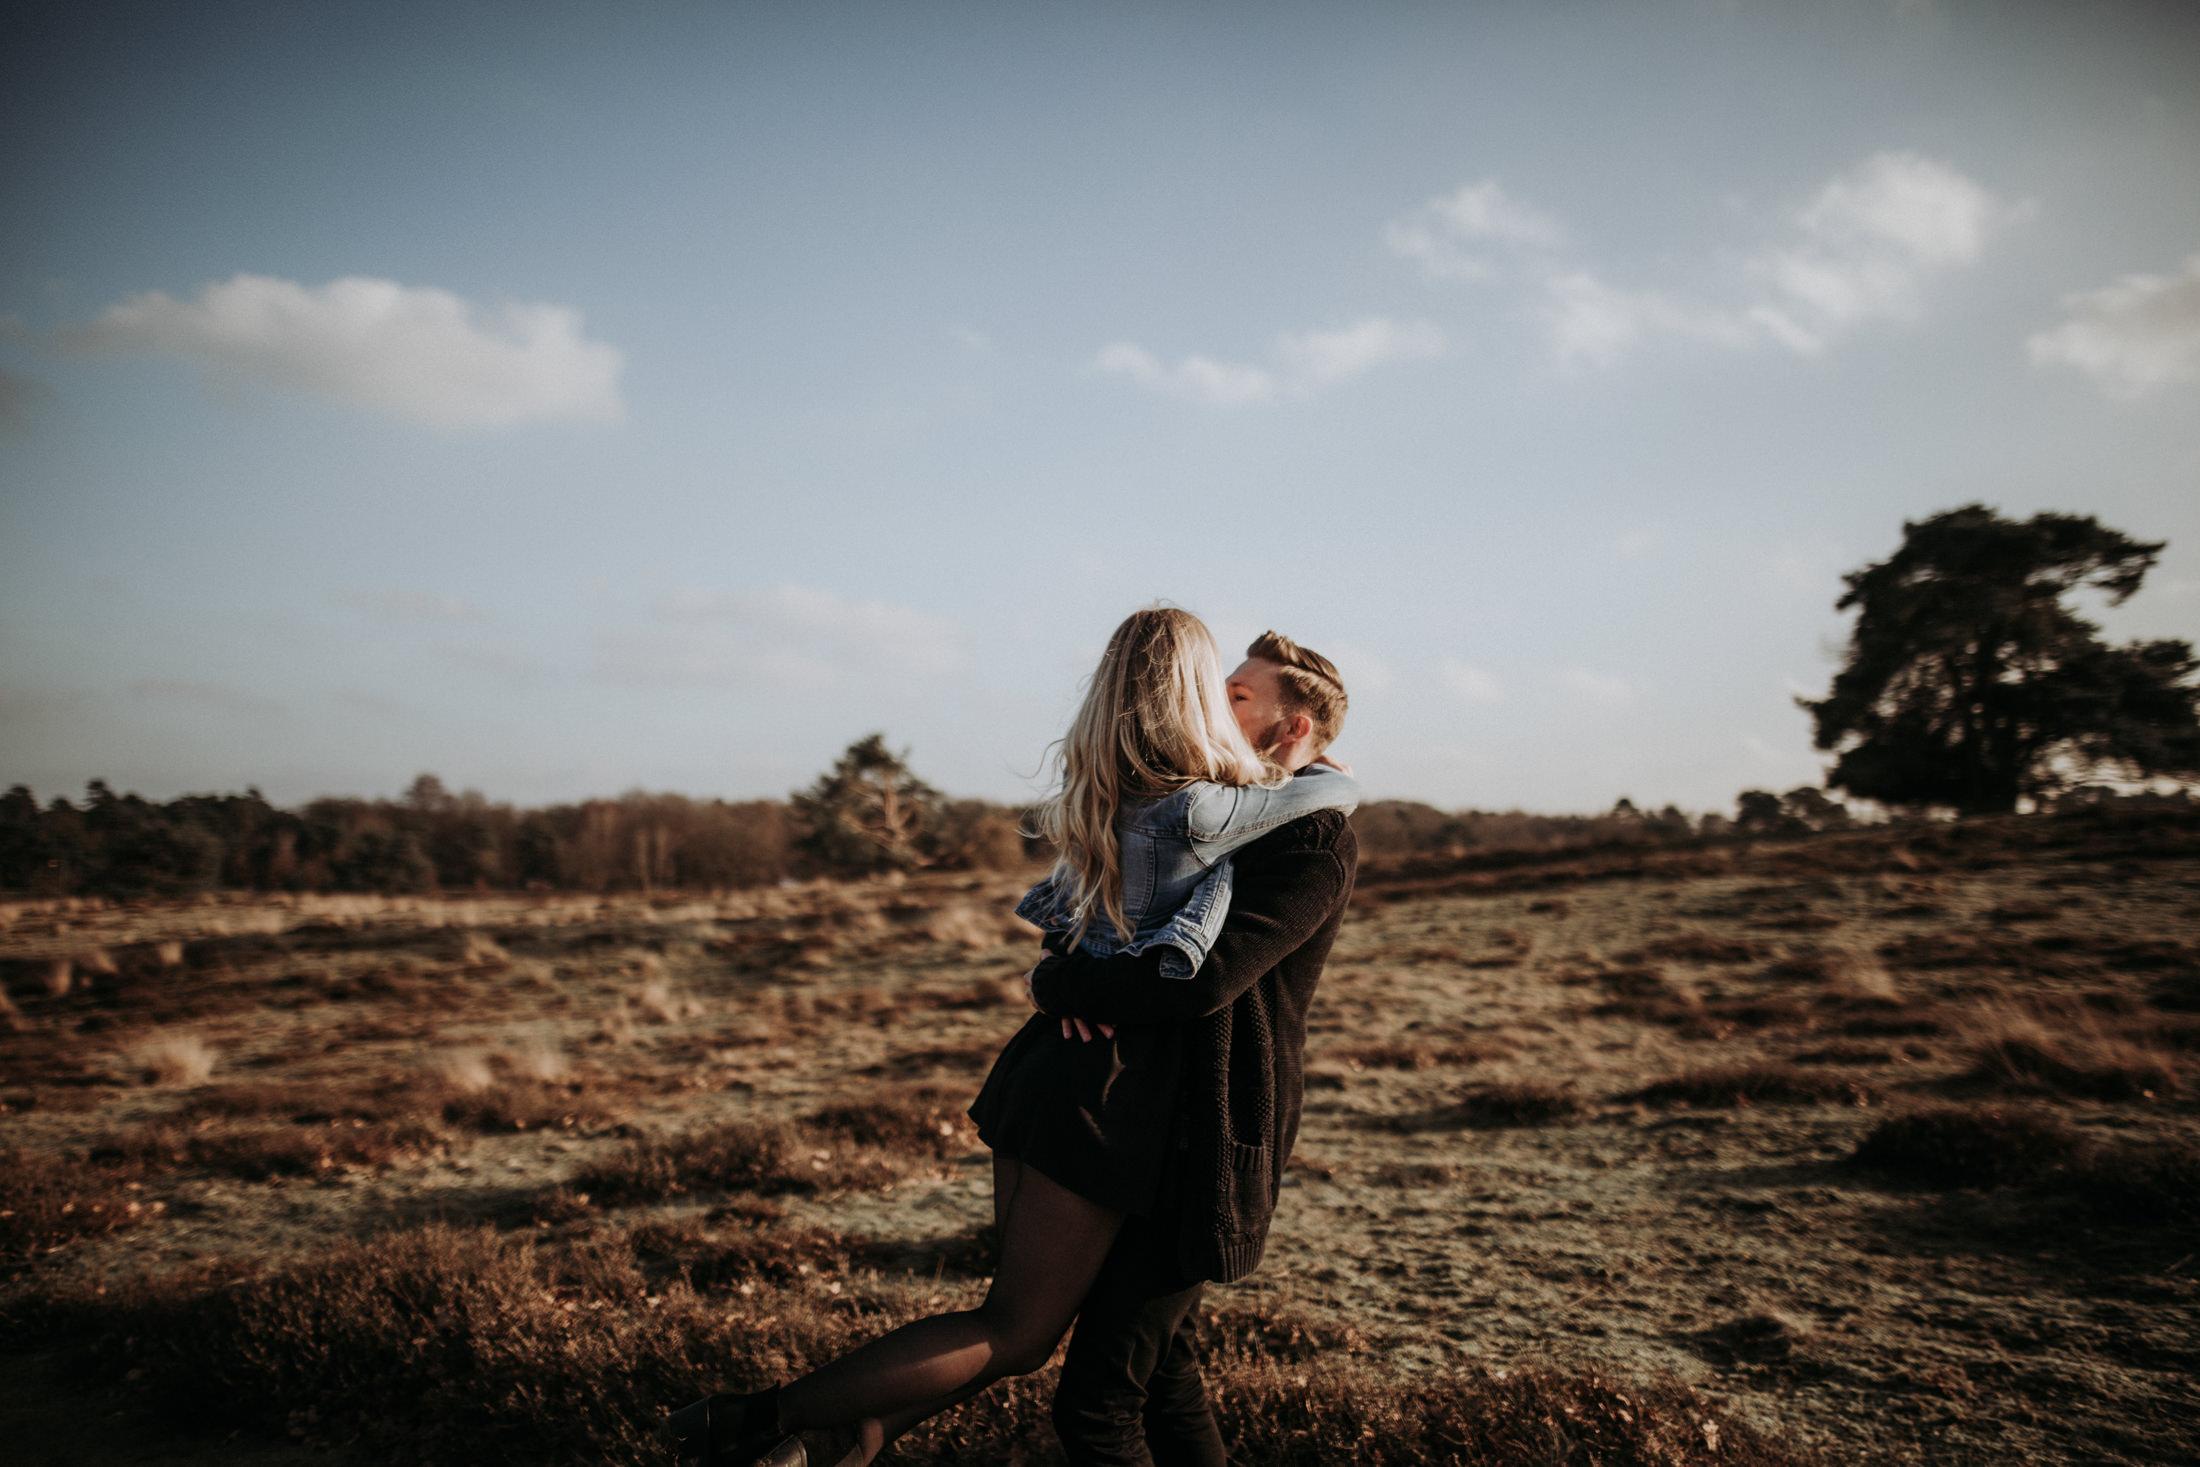 Wedding_Photographer_Mallorca_Daniela-Marquardt_Photography_CanaryIslands_Lanzarote_Iceland_Tuskany_Santorini_Portugal__Austria_Elopement_Hochzeitsfotograf_Milena_Marvin_19